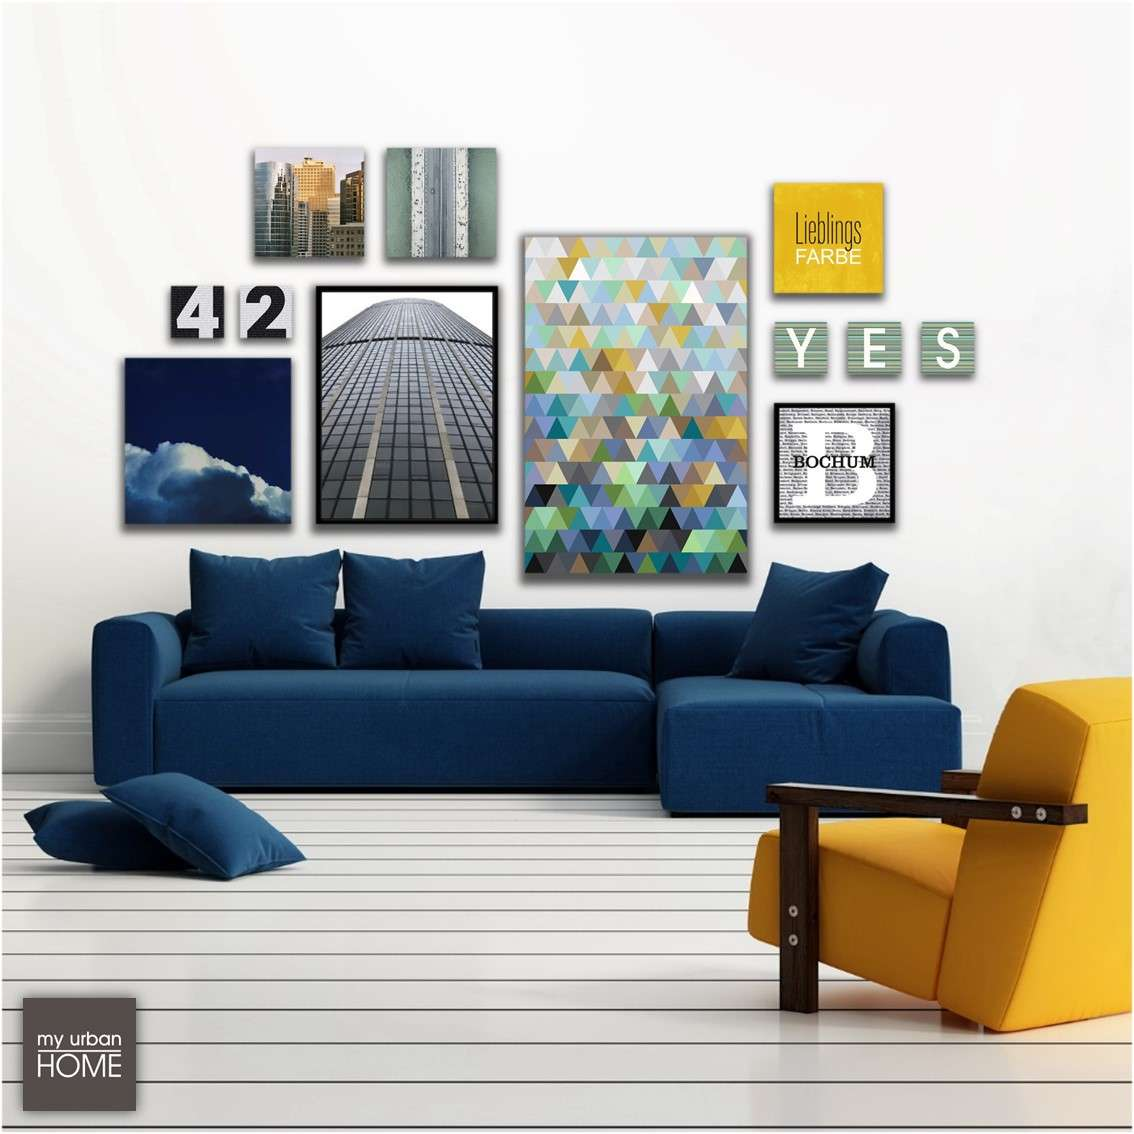 Leinwandbilder 12-teiliges Bilderset ART6006, CLOUDS, CITY-LETTER, NUMBERS, LIEBLIBGSFARBE...